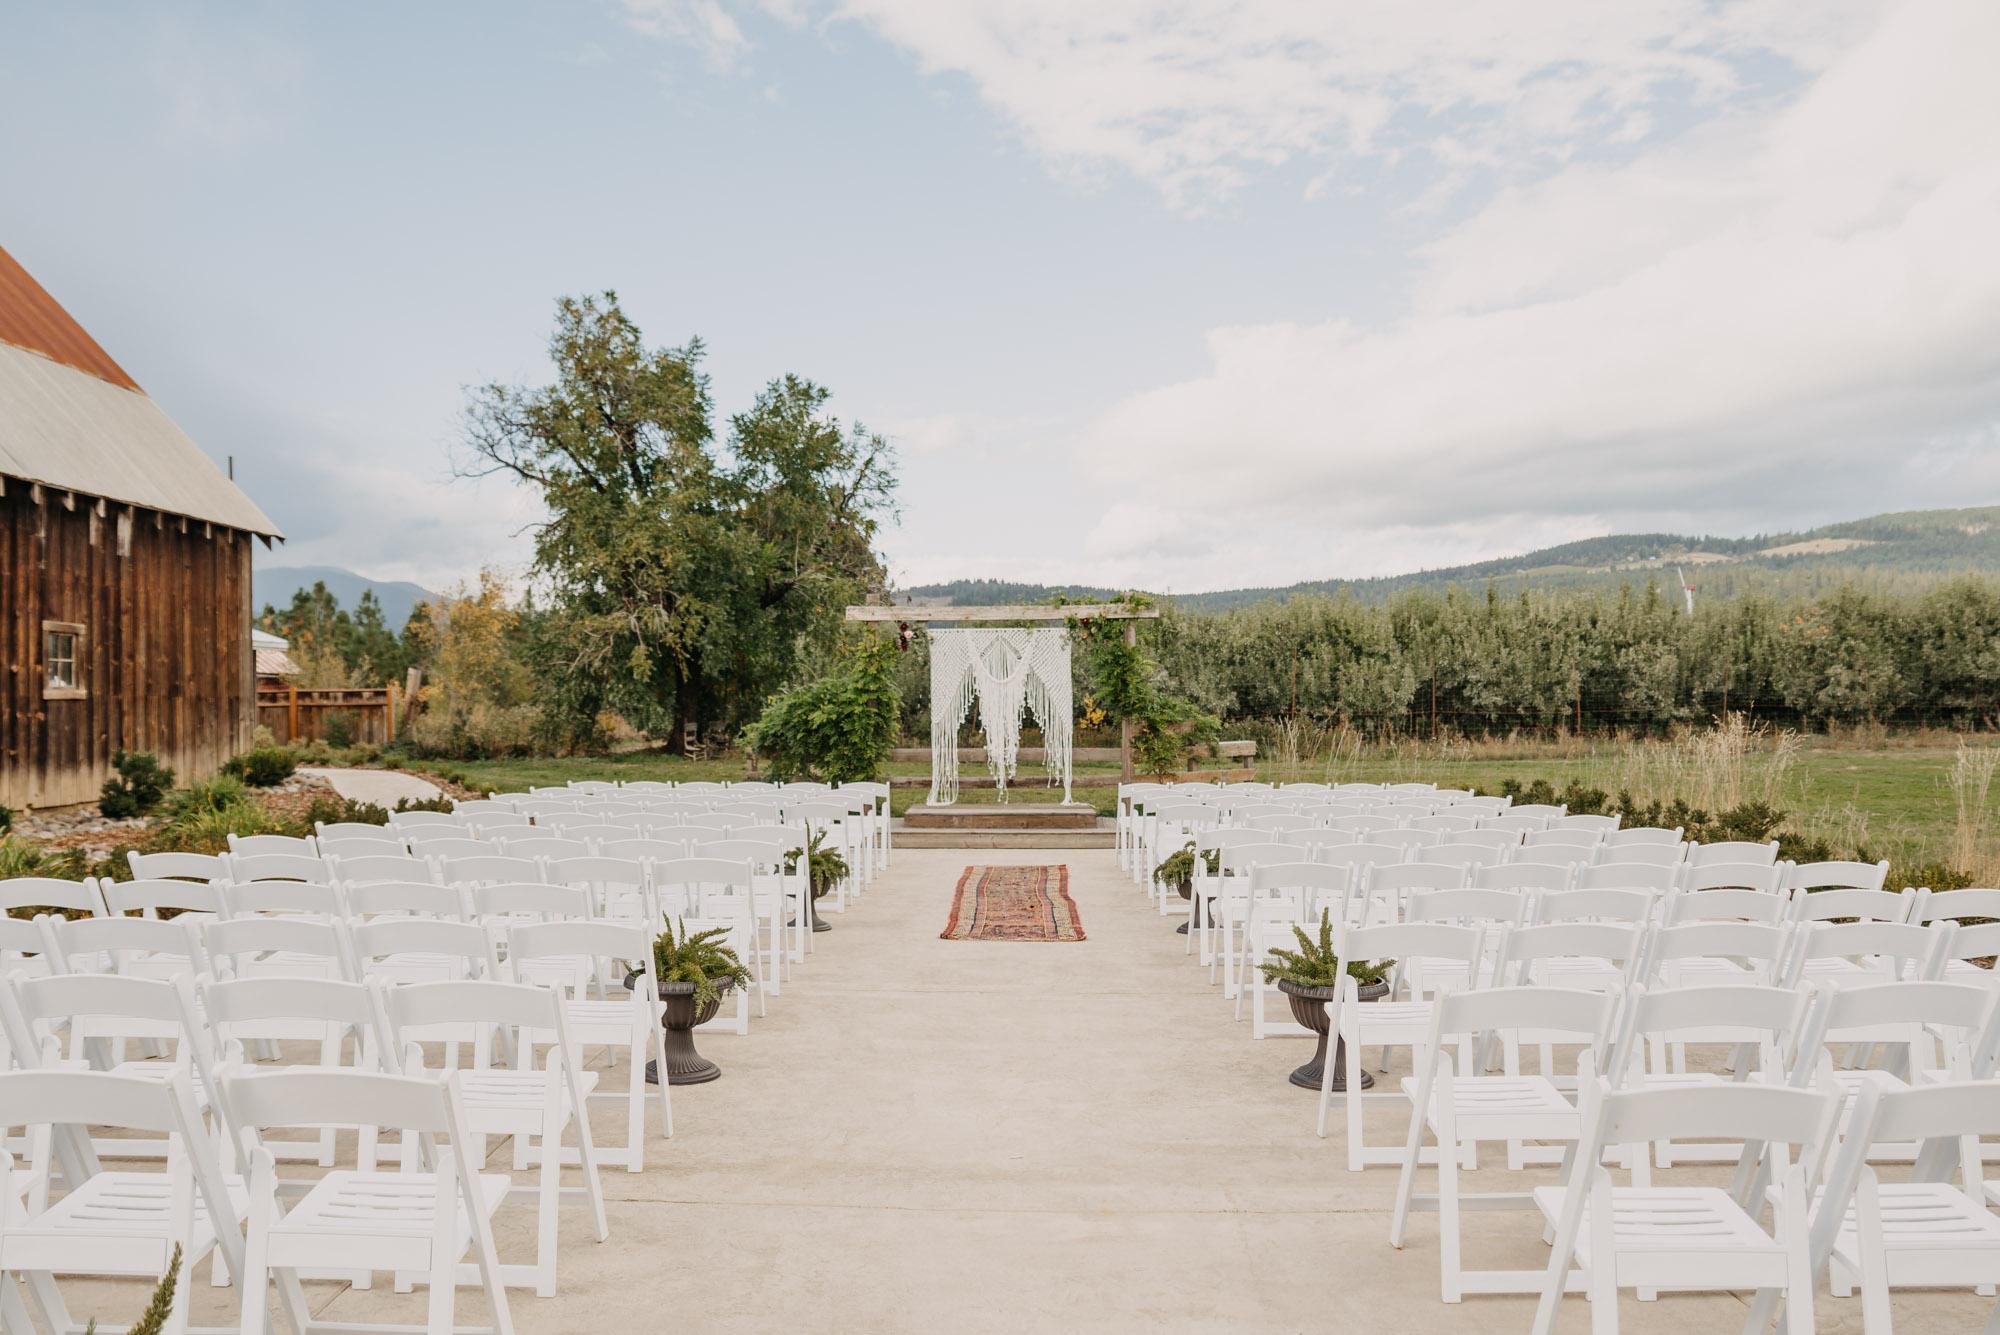 Outdoor-Summer-Ceremony-Washington-Wedding-Rainbow-5228.jpg